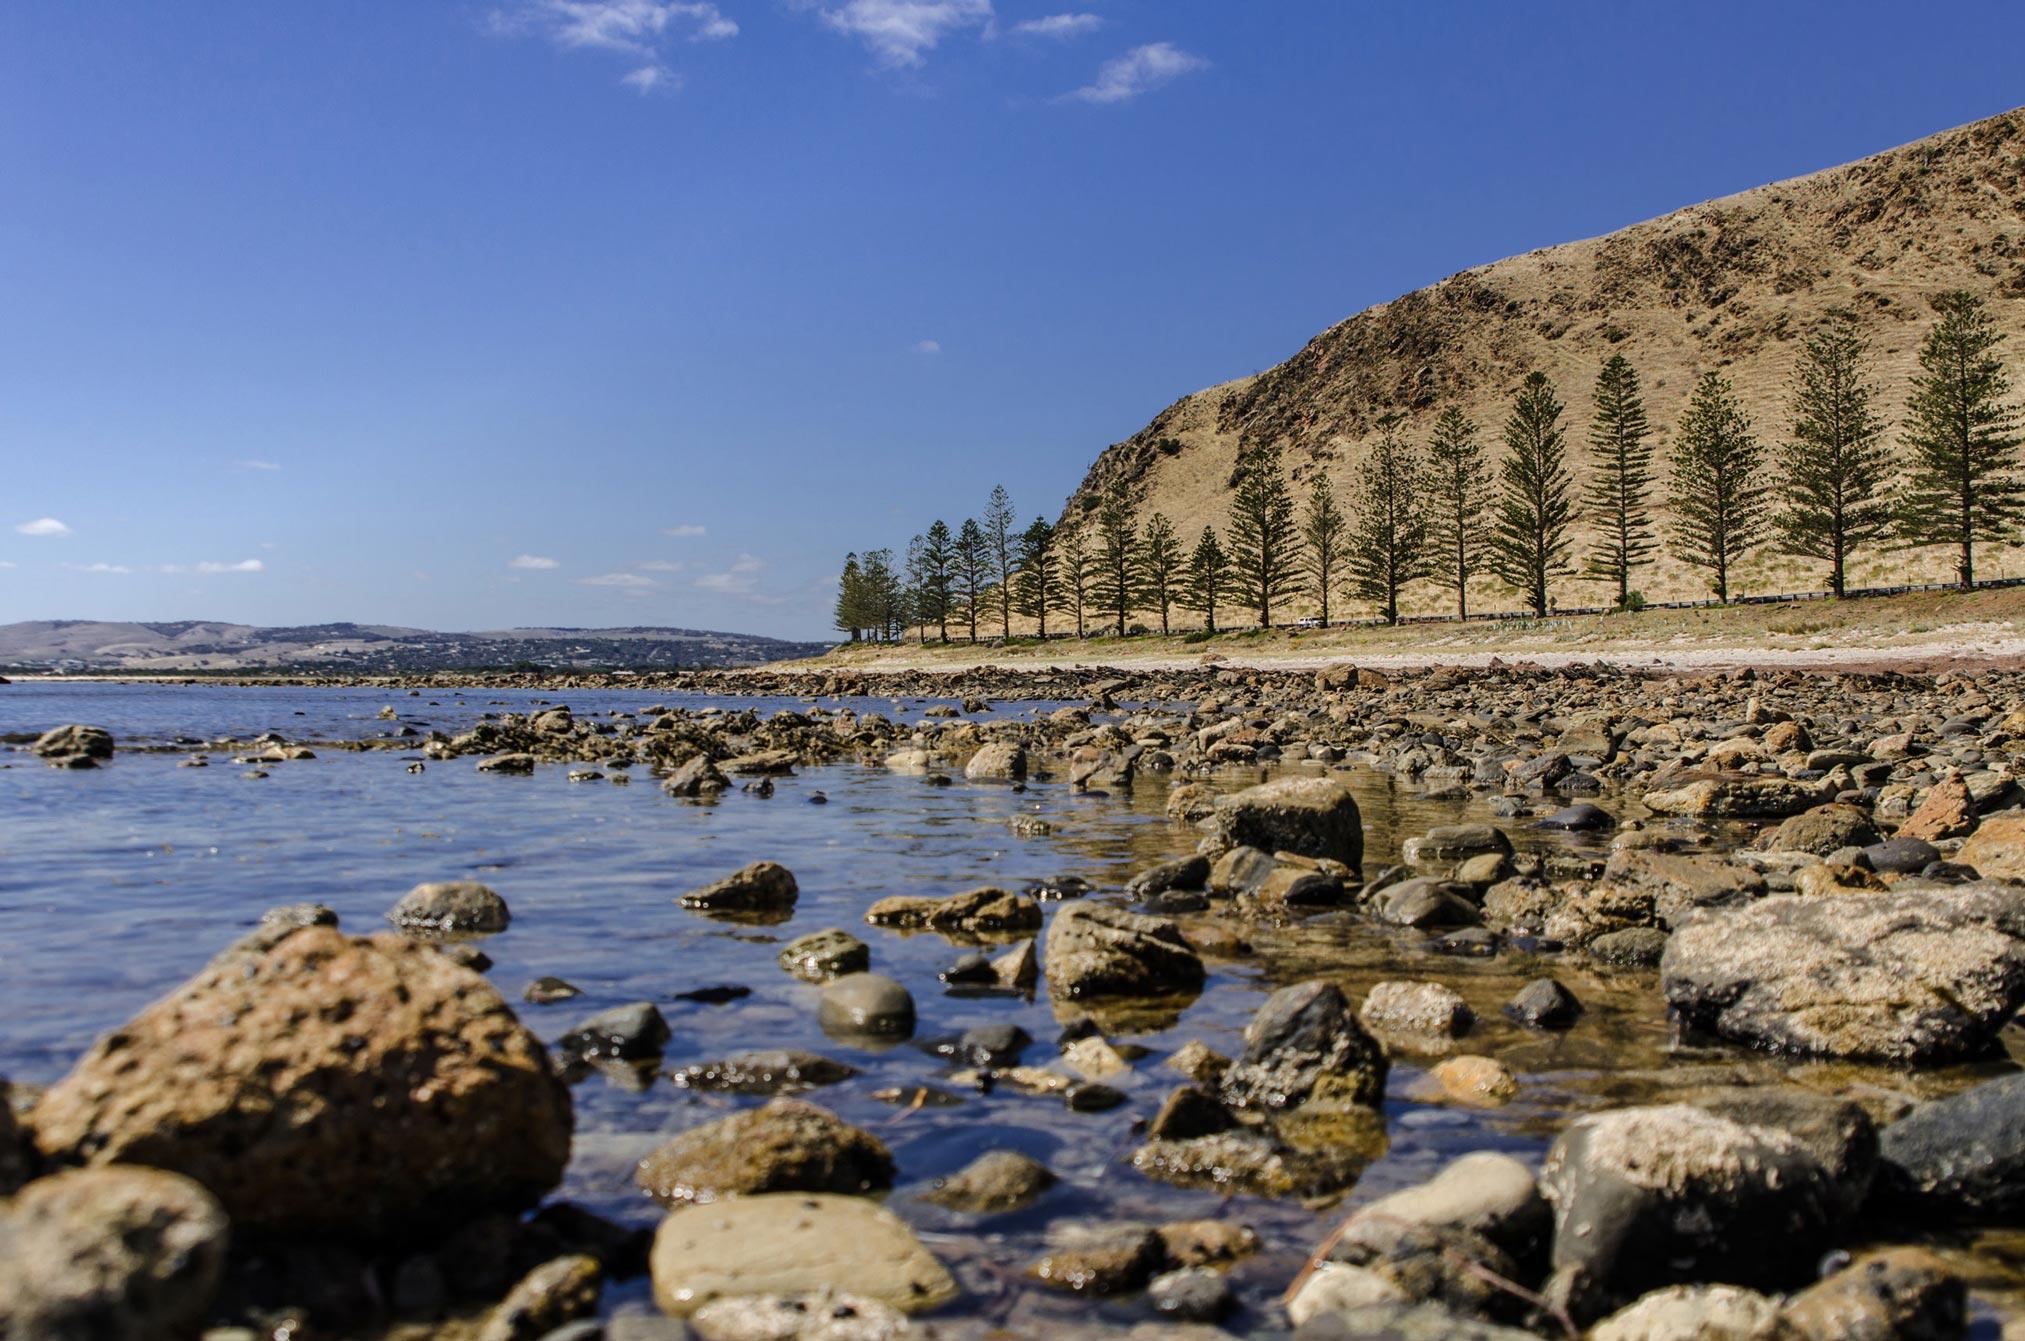 Paesaggi-Australia - DSC 4572 - Fotografo di paesaggi Australia - Fotografo di paesaggi Australia